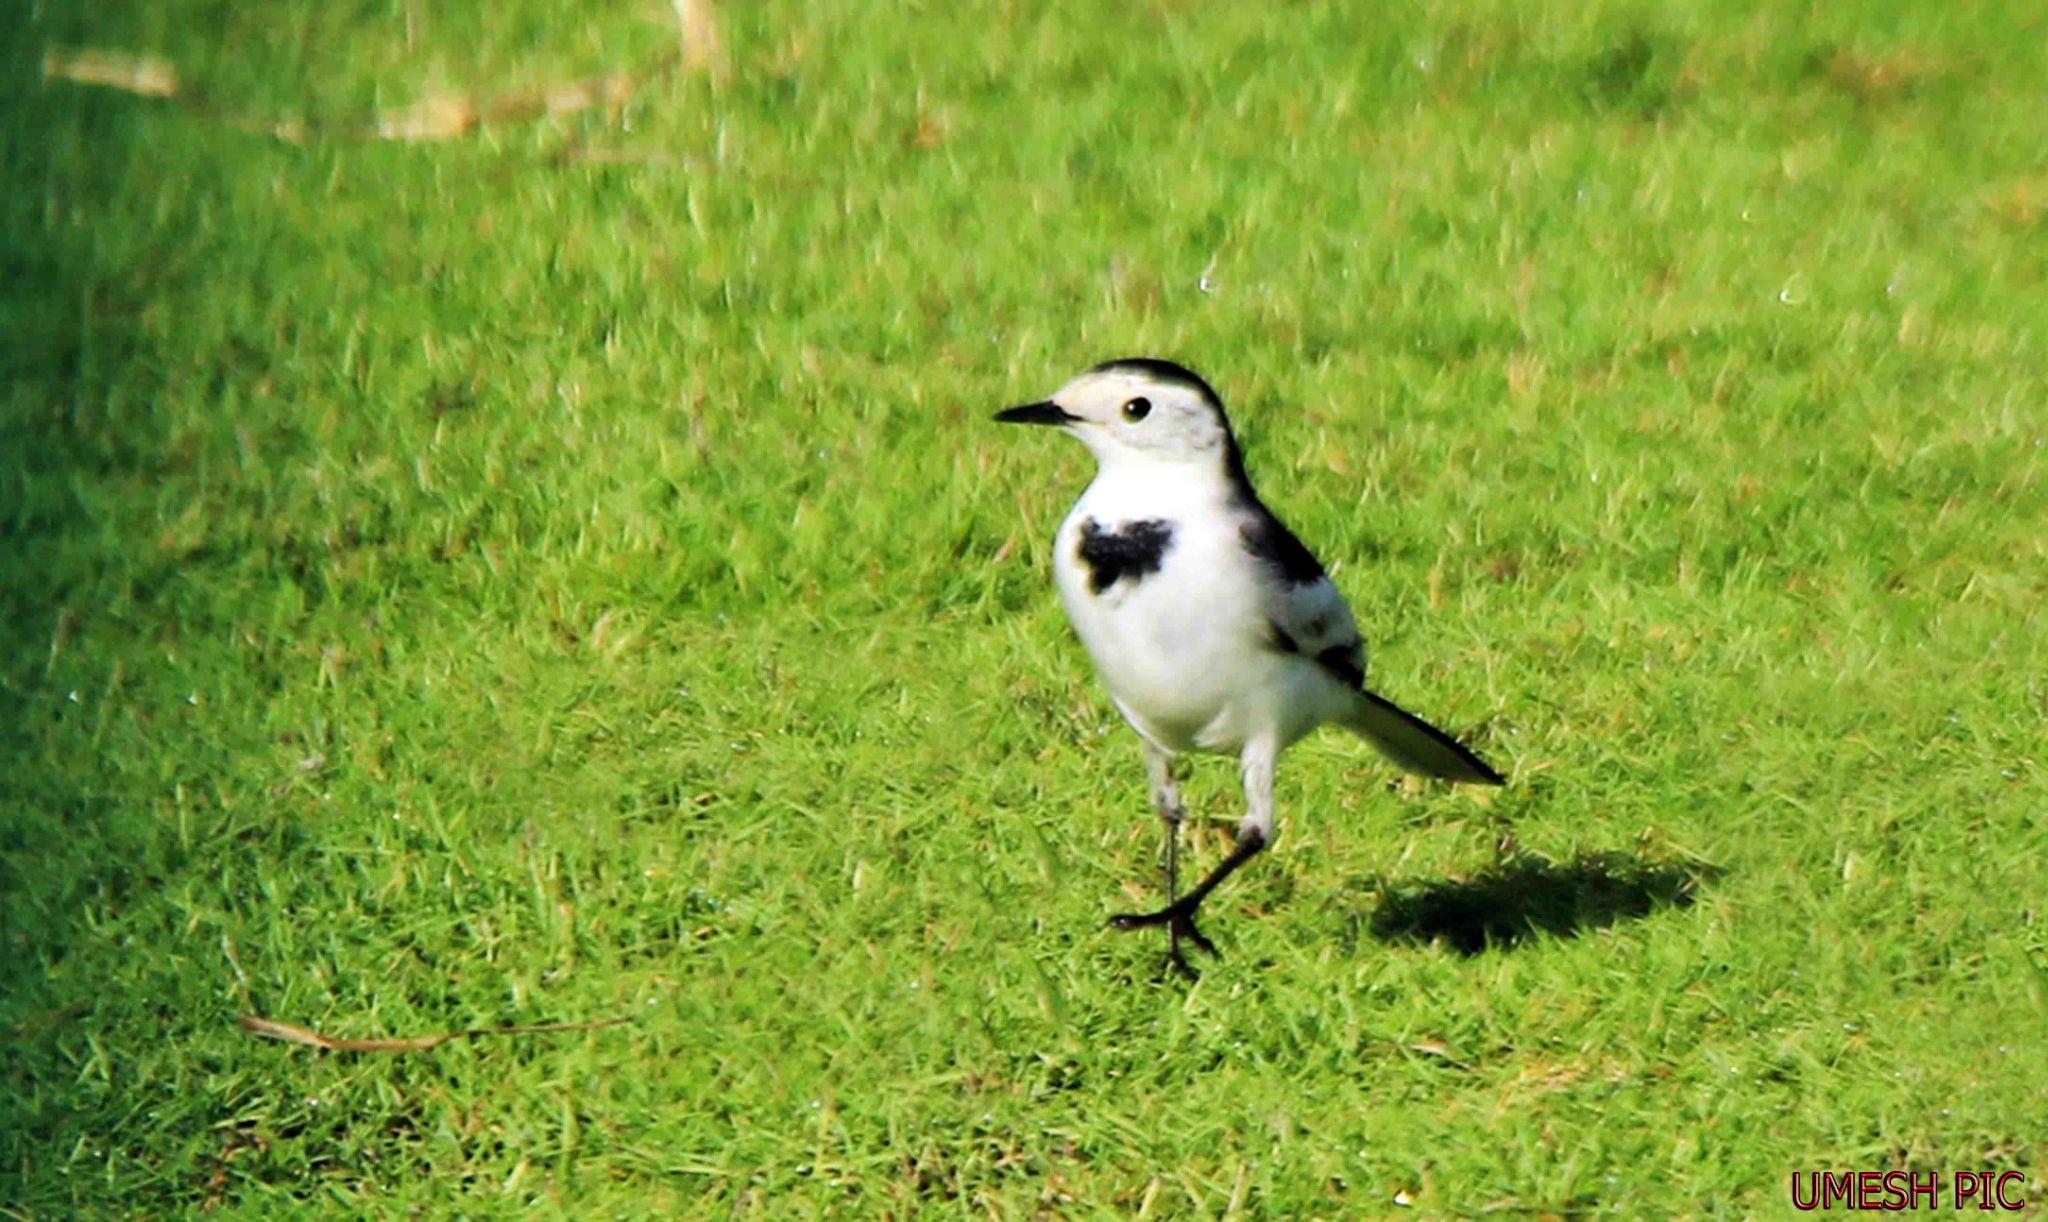 A BIRD by umesh pun